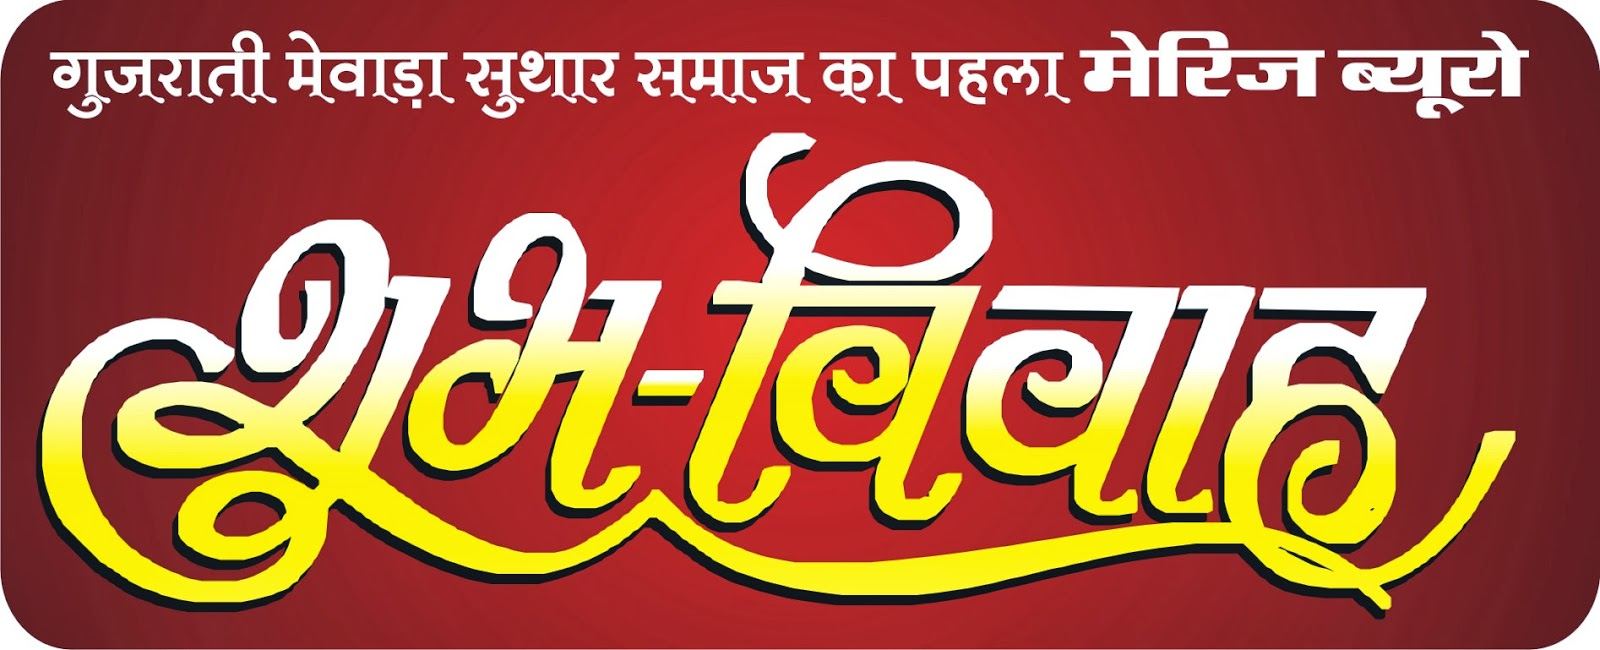 shubh vivah logo joy studio design gallery   best design